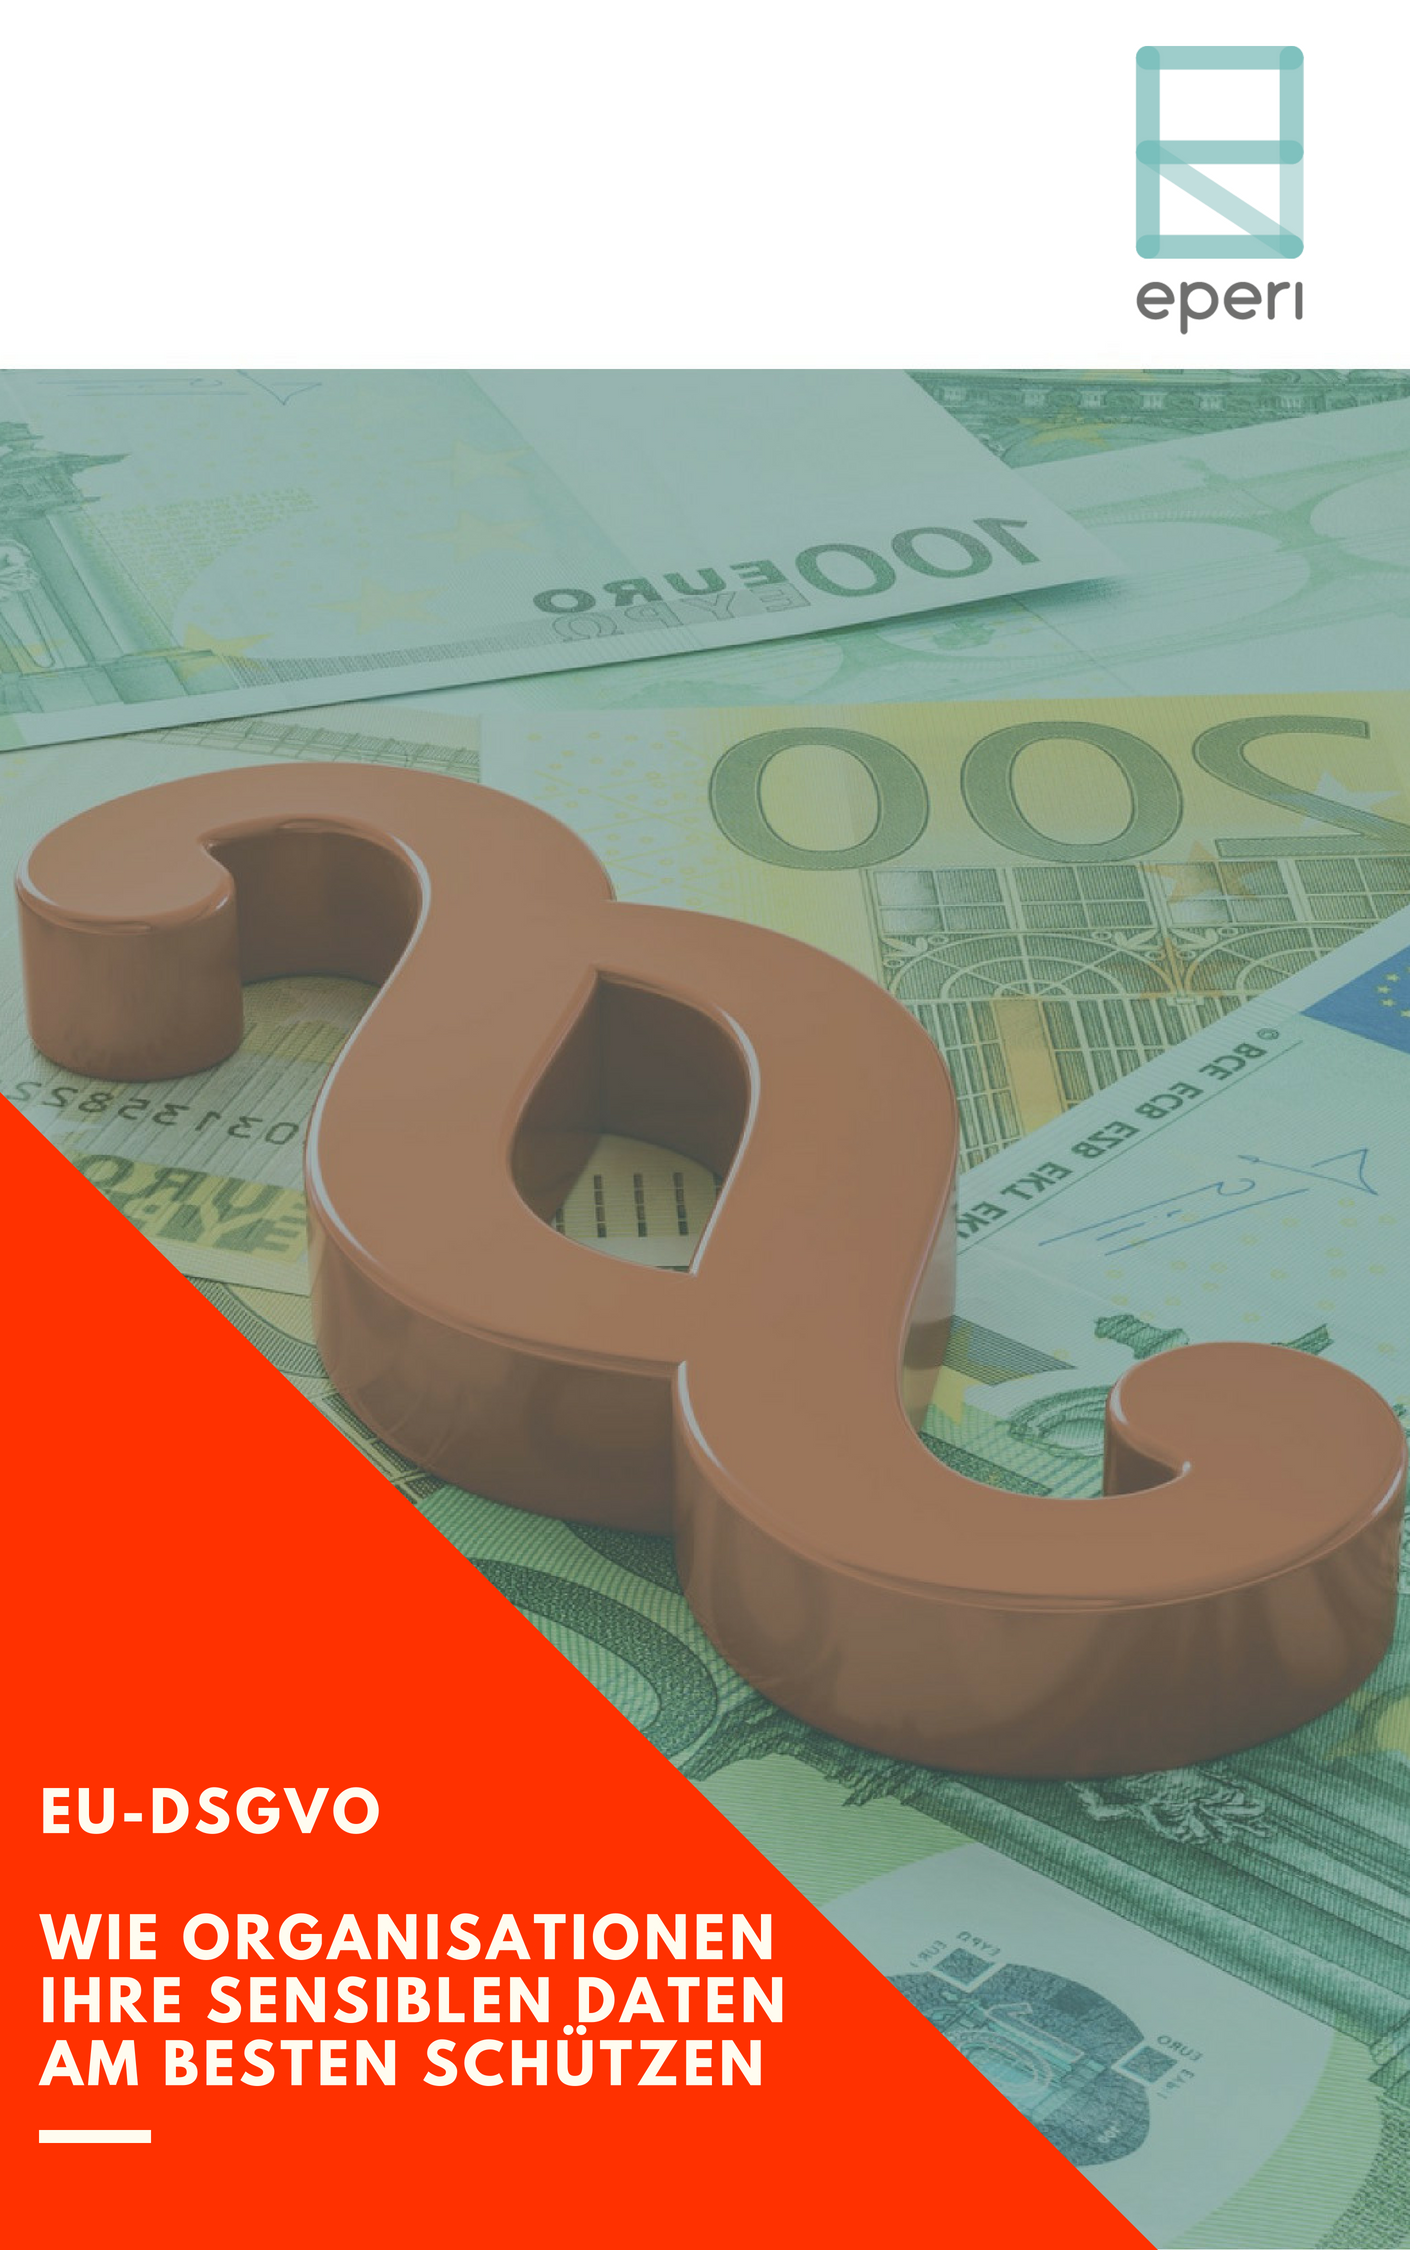 eperi eBook DSGVO Datenschutz Cover DE